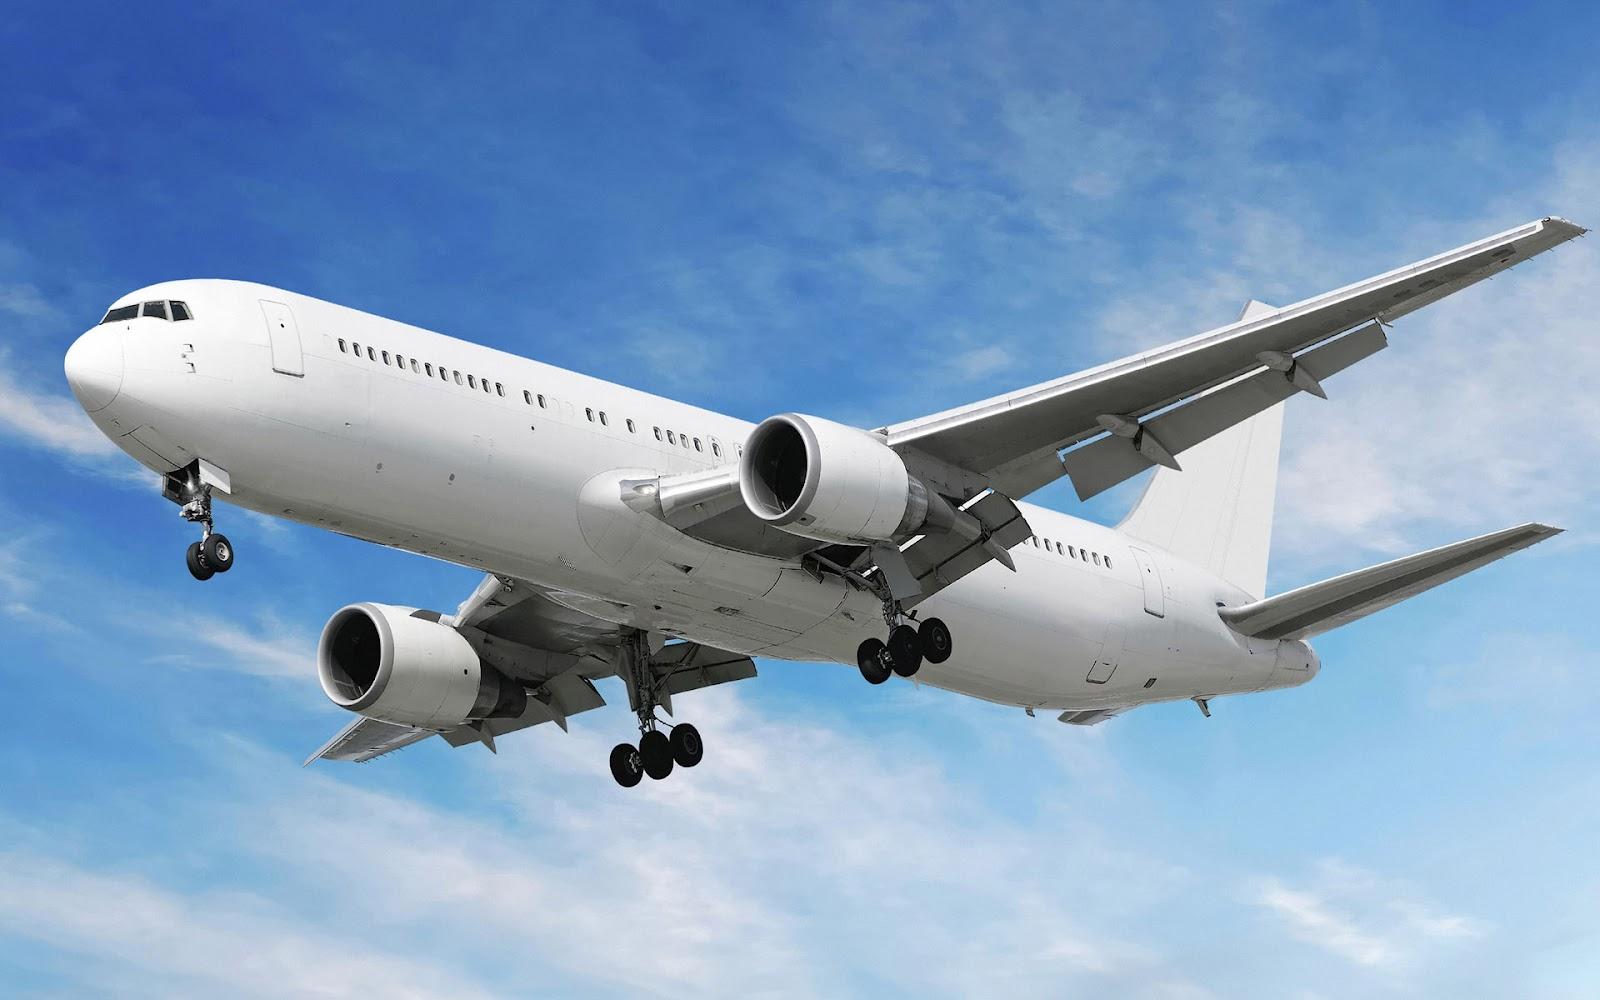 http://1.bp.blogspot.com/-QRqa_BKWpfc/UDnS4yGrMbI/AAAAAAAAD_Y/gZdUMBHruVw/s1600/avion-1.jpg